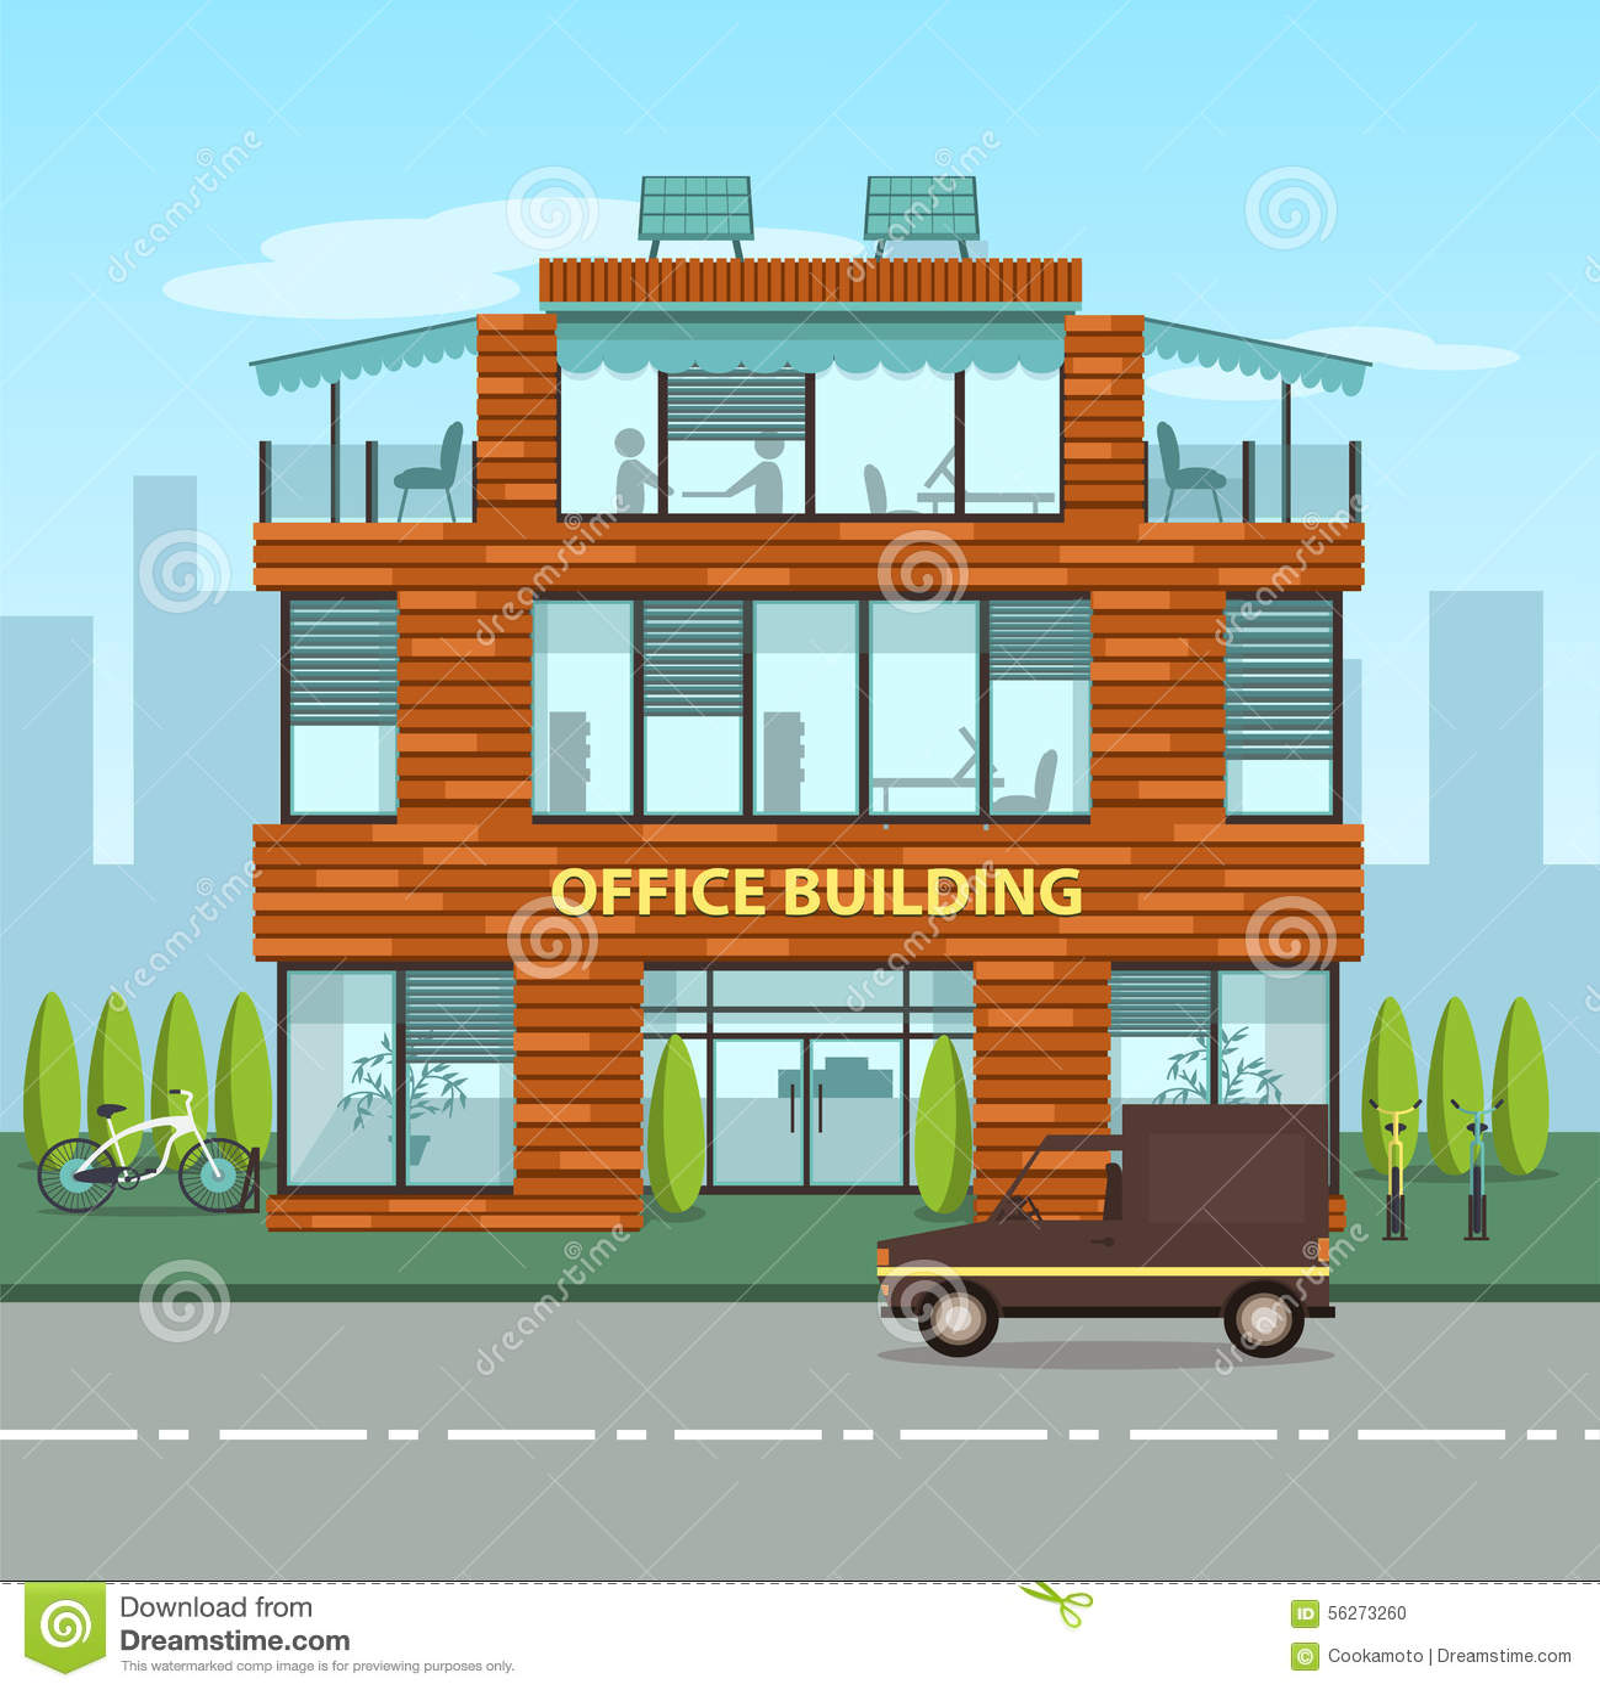 Cutaway Office Building With Interior Design Plan Cartoon